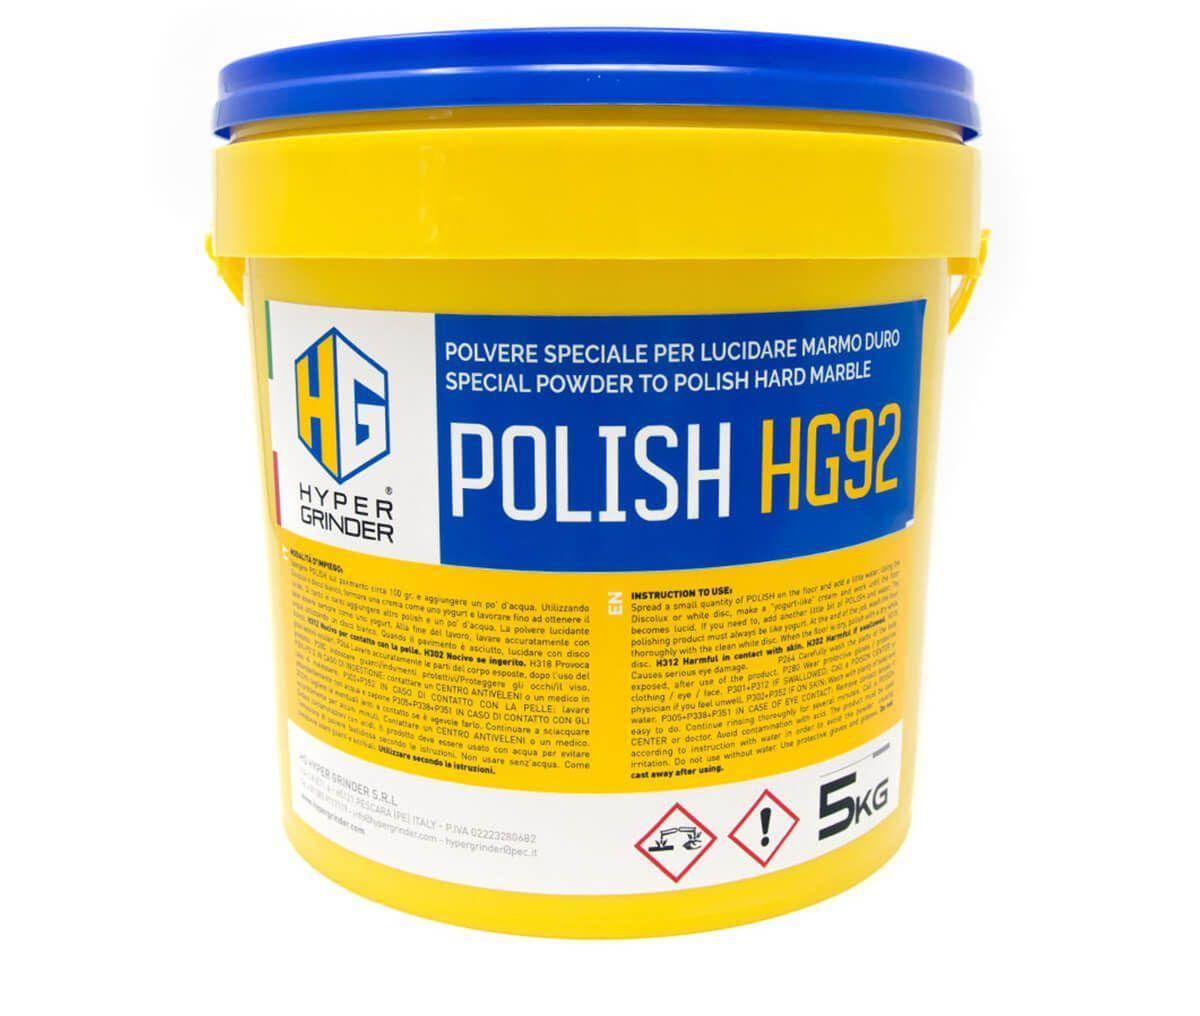 polishhg92 1237